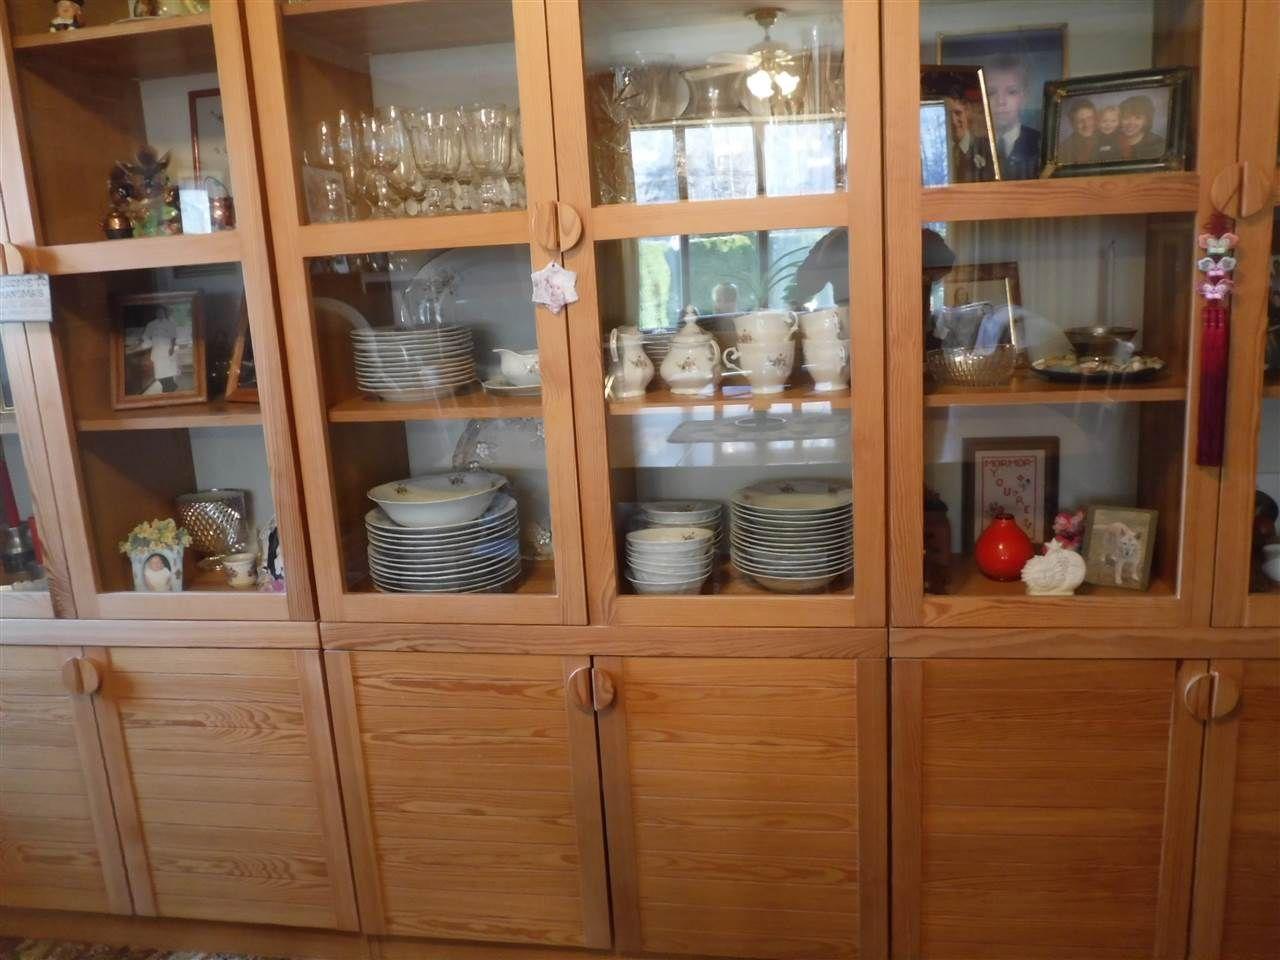 Photo 14: Photos: 1599 MACKENZIE Highway in Bella Coola: Bella Coola/Hagensborg House for sale (Williams Lake (Zone 27))  : MLS®# R2449026